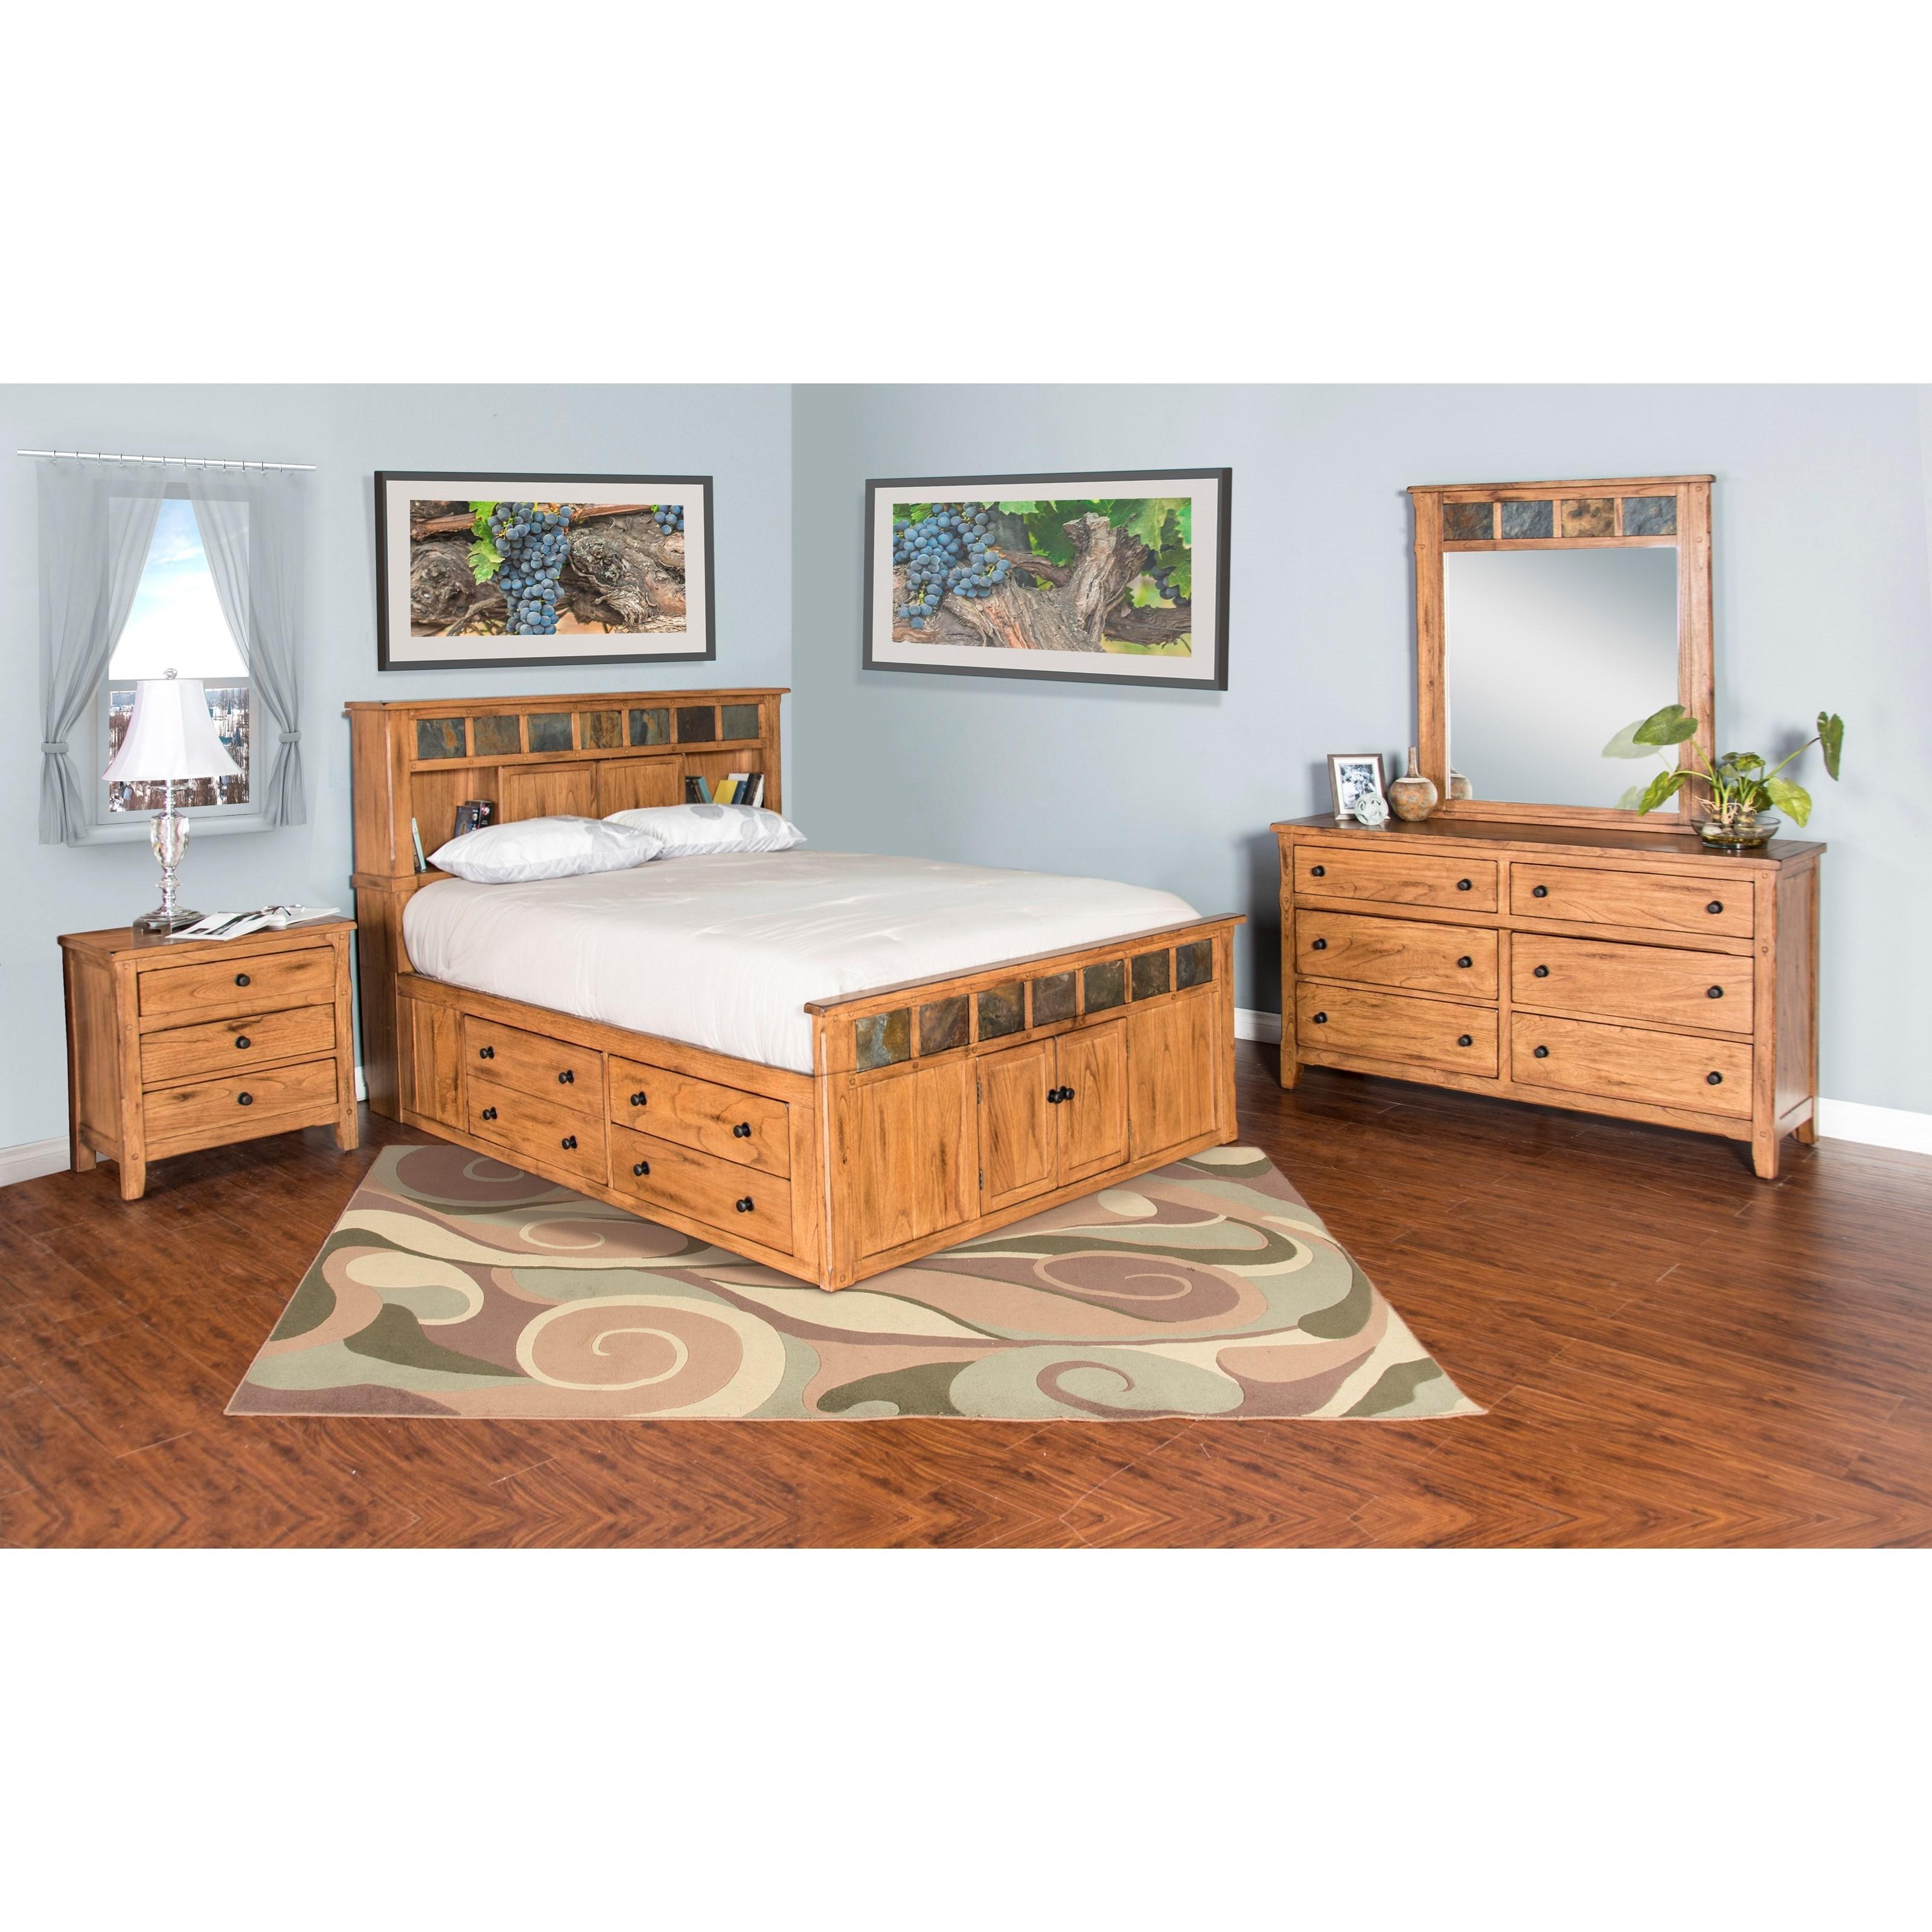 Sunny designs sedona queen bedroom group john v schultz for Bedroom groups